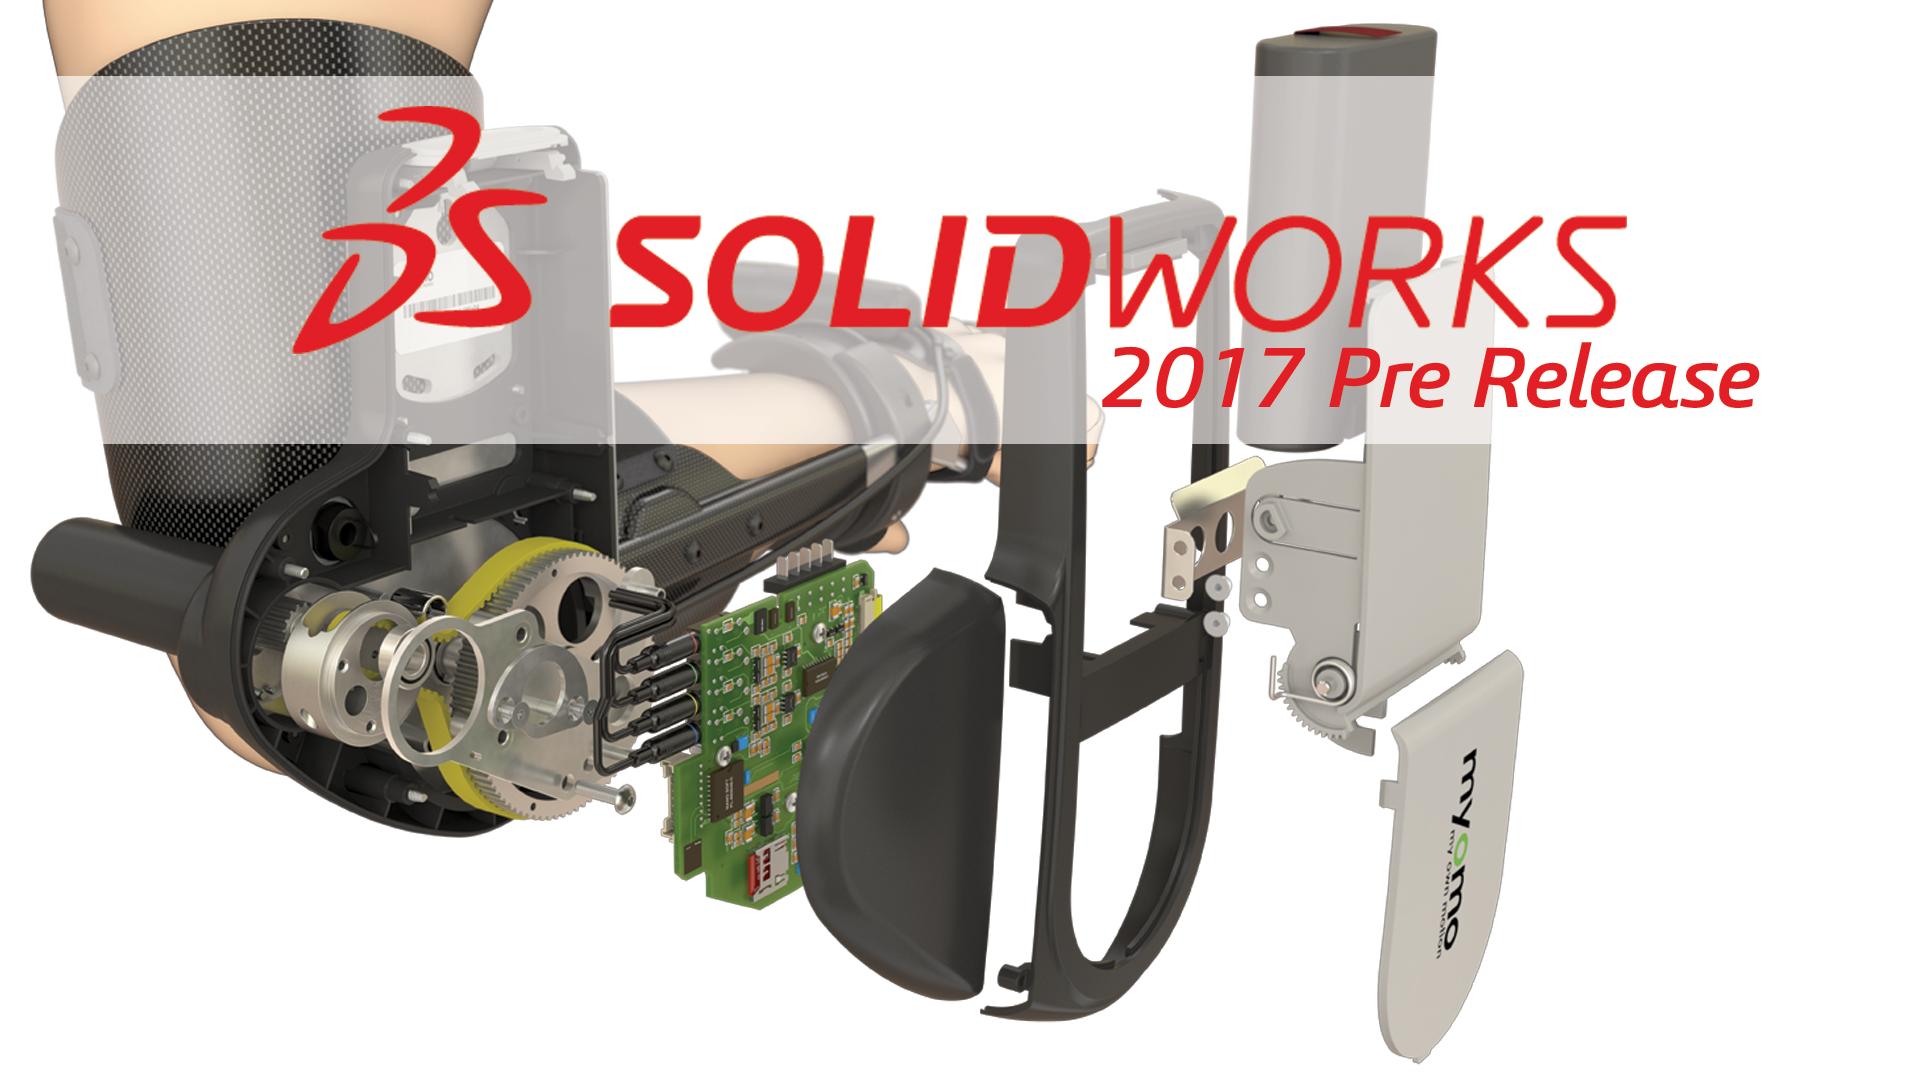 SOLIDWORKS 2017 Pre Release dostępny do pobrania